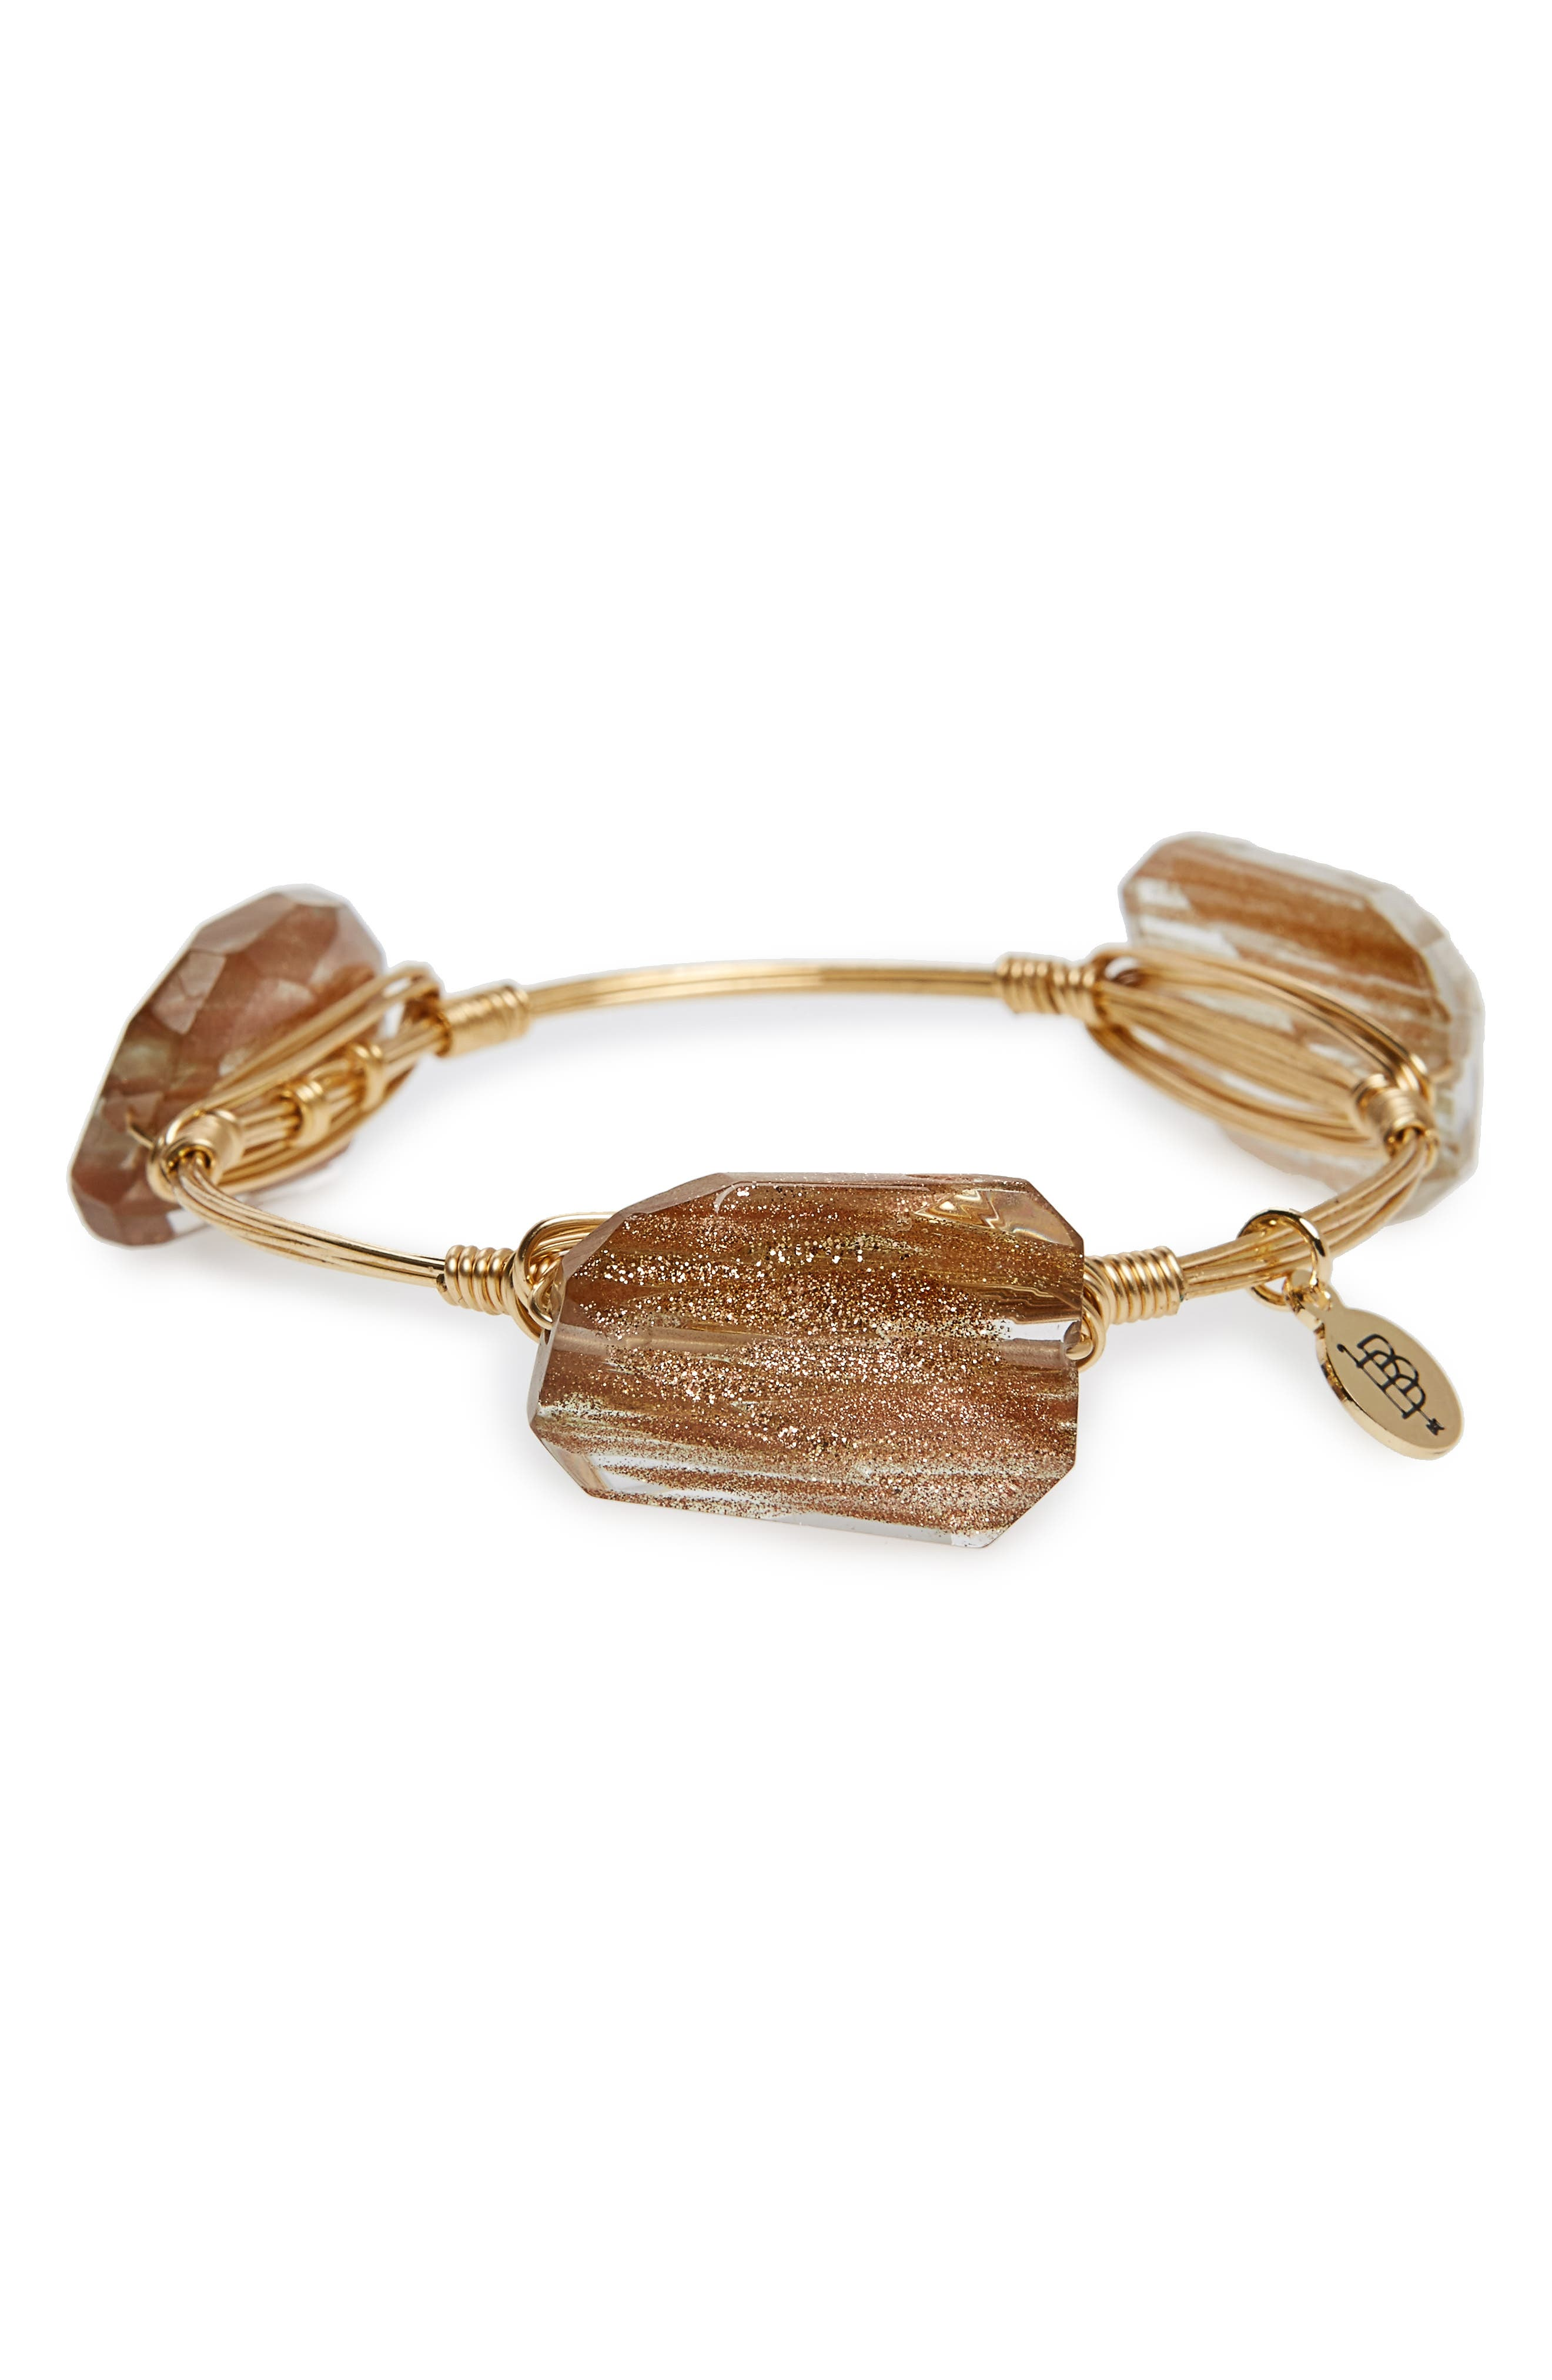 Bourbon and Boweties Wire Bracelet